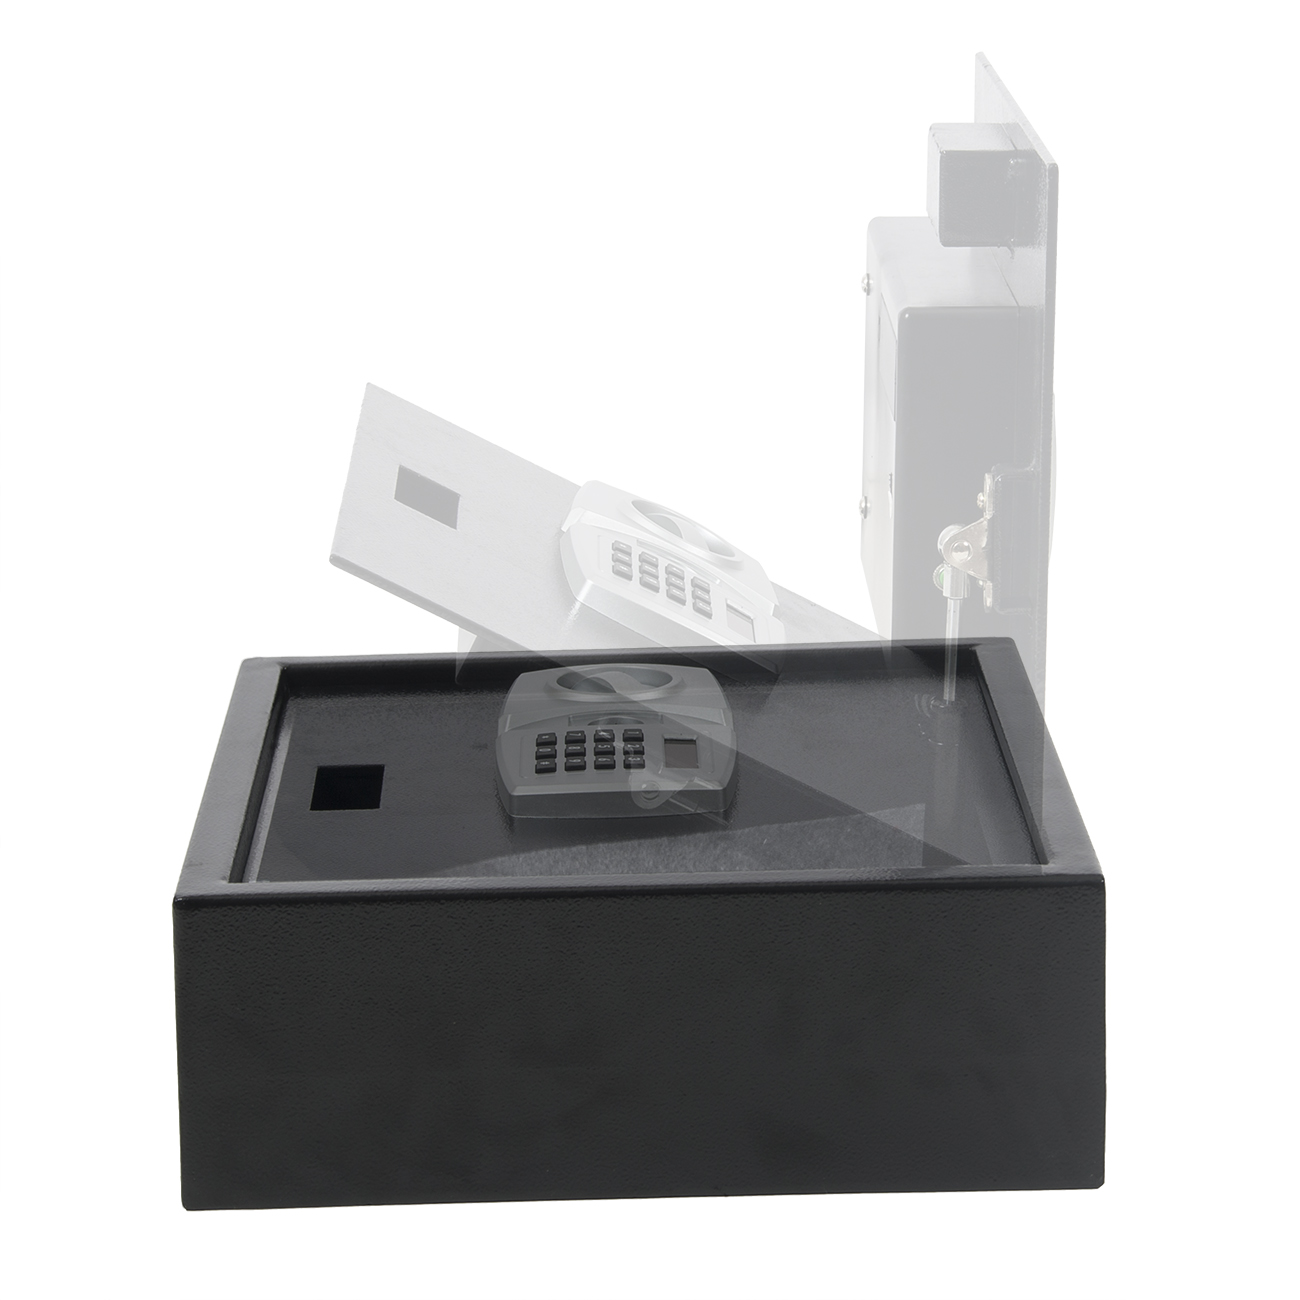 Digital LCD Lock Electronic Keypad Top-Opening Safe ...